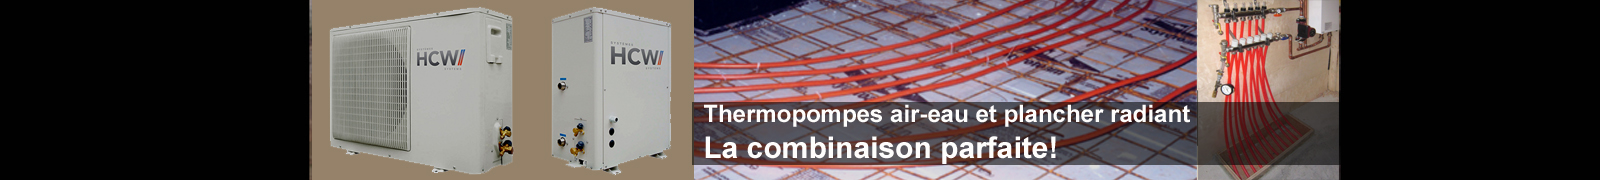 thermopompe-radiant1010X180